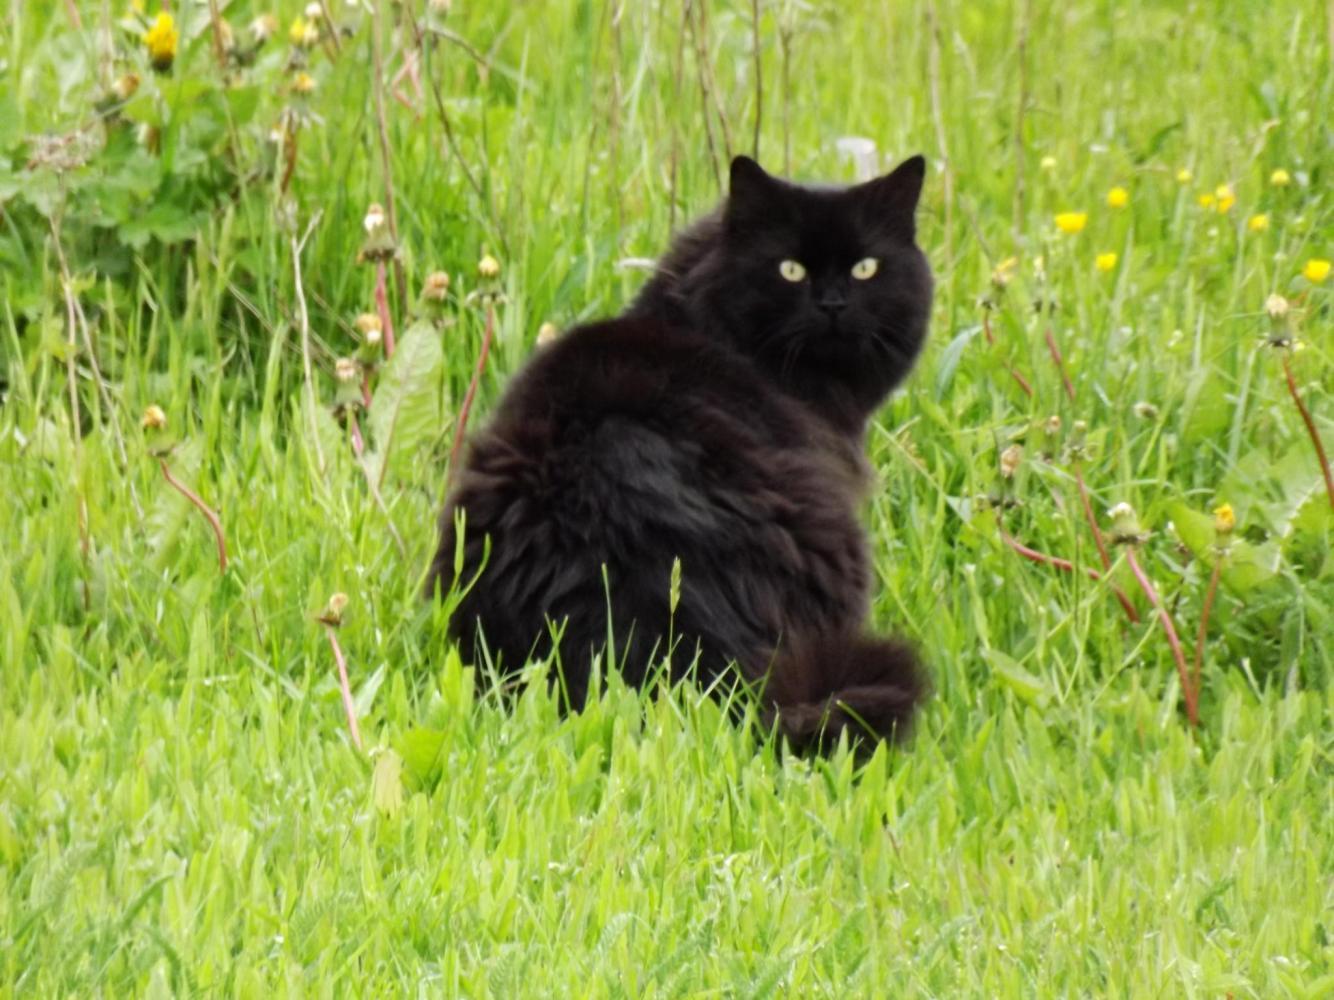 Black_pussy_-_panoramio.thumb.jpg.e3cf6c6d4cdd1145c52c87d089c080f8.jpg